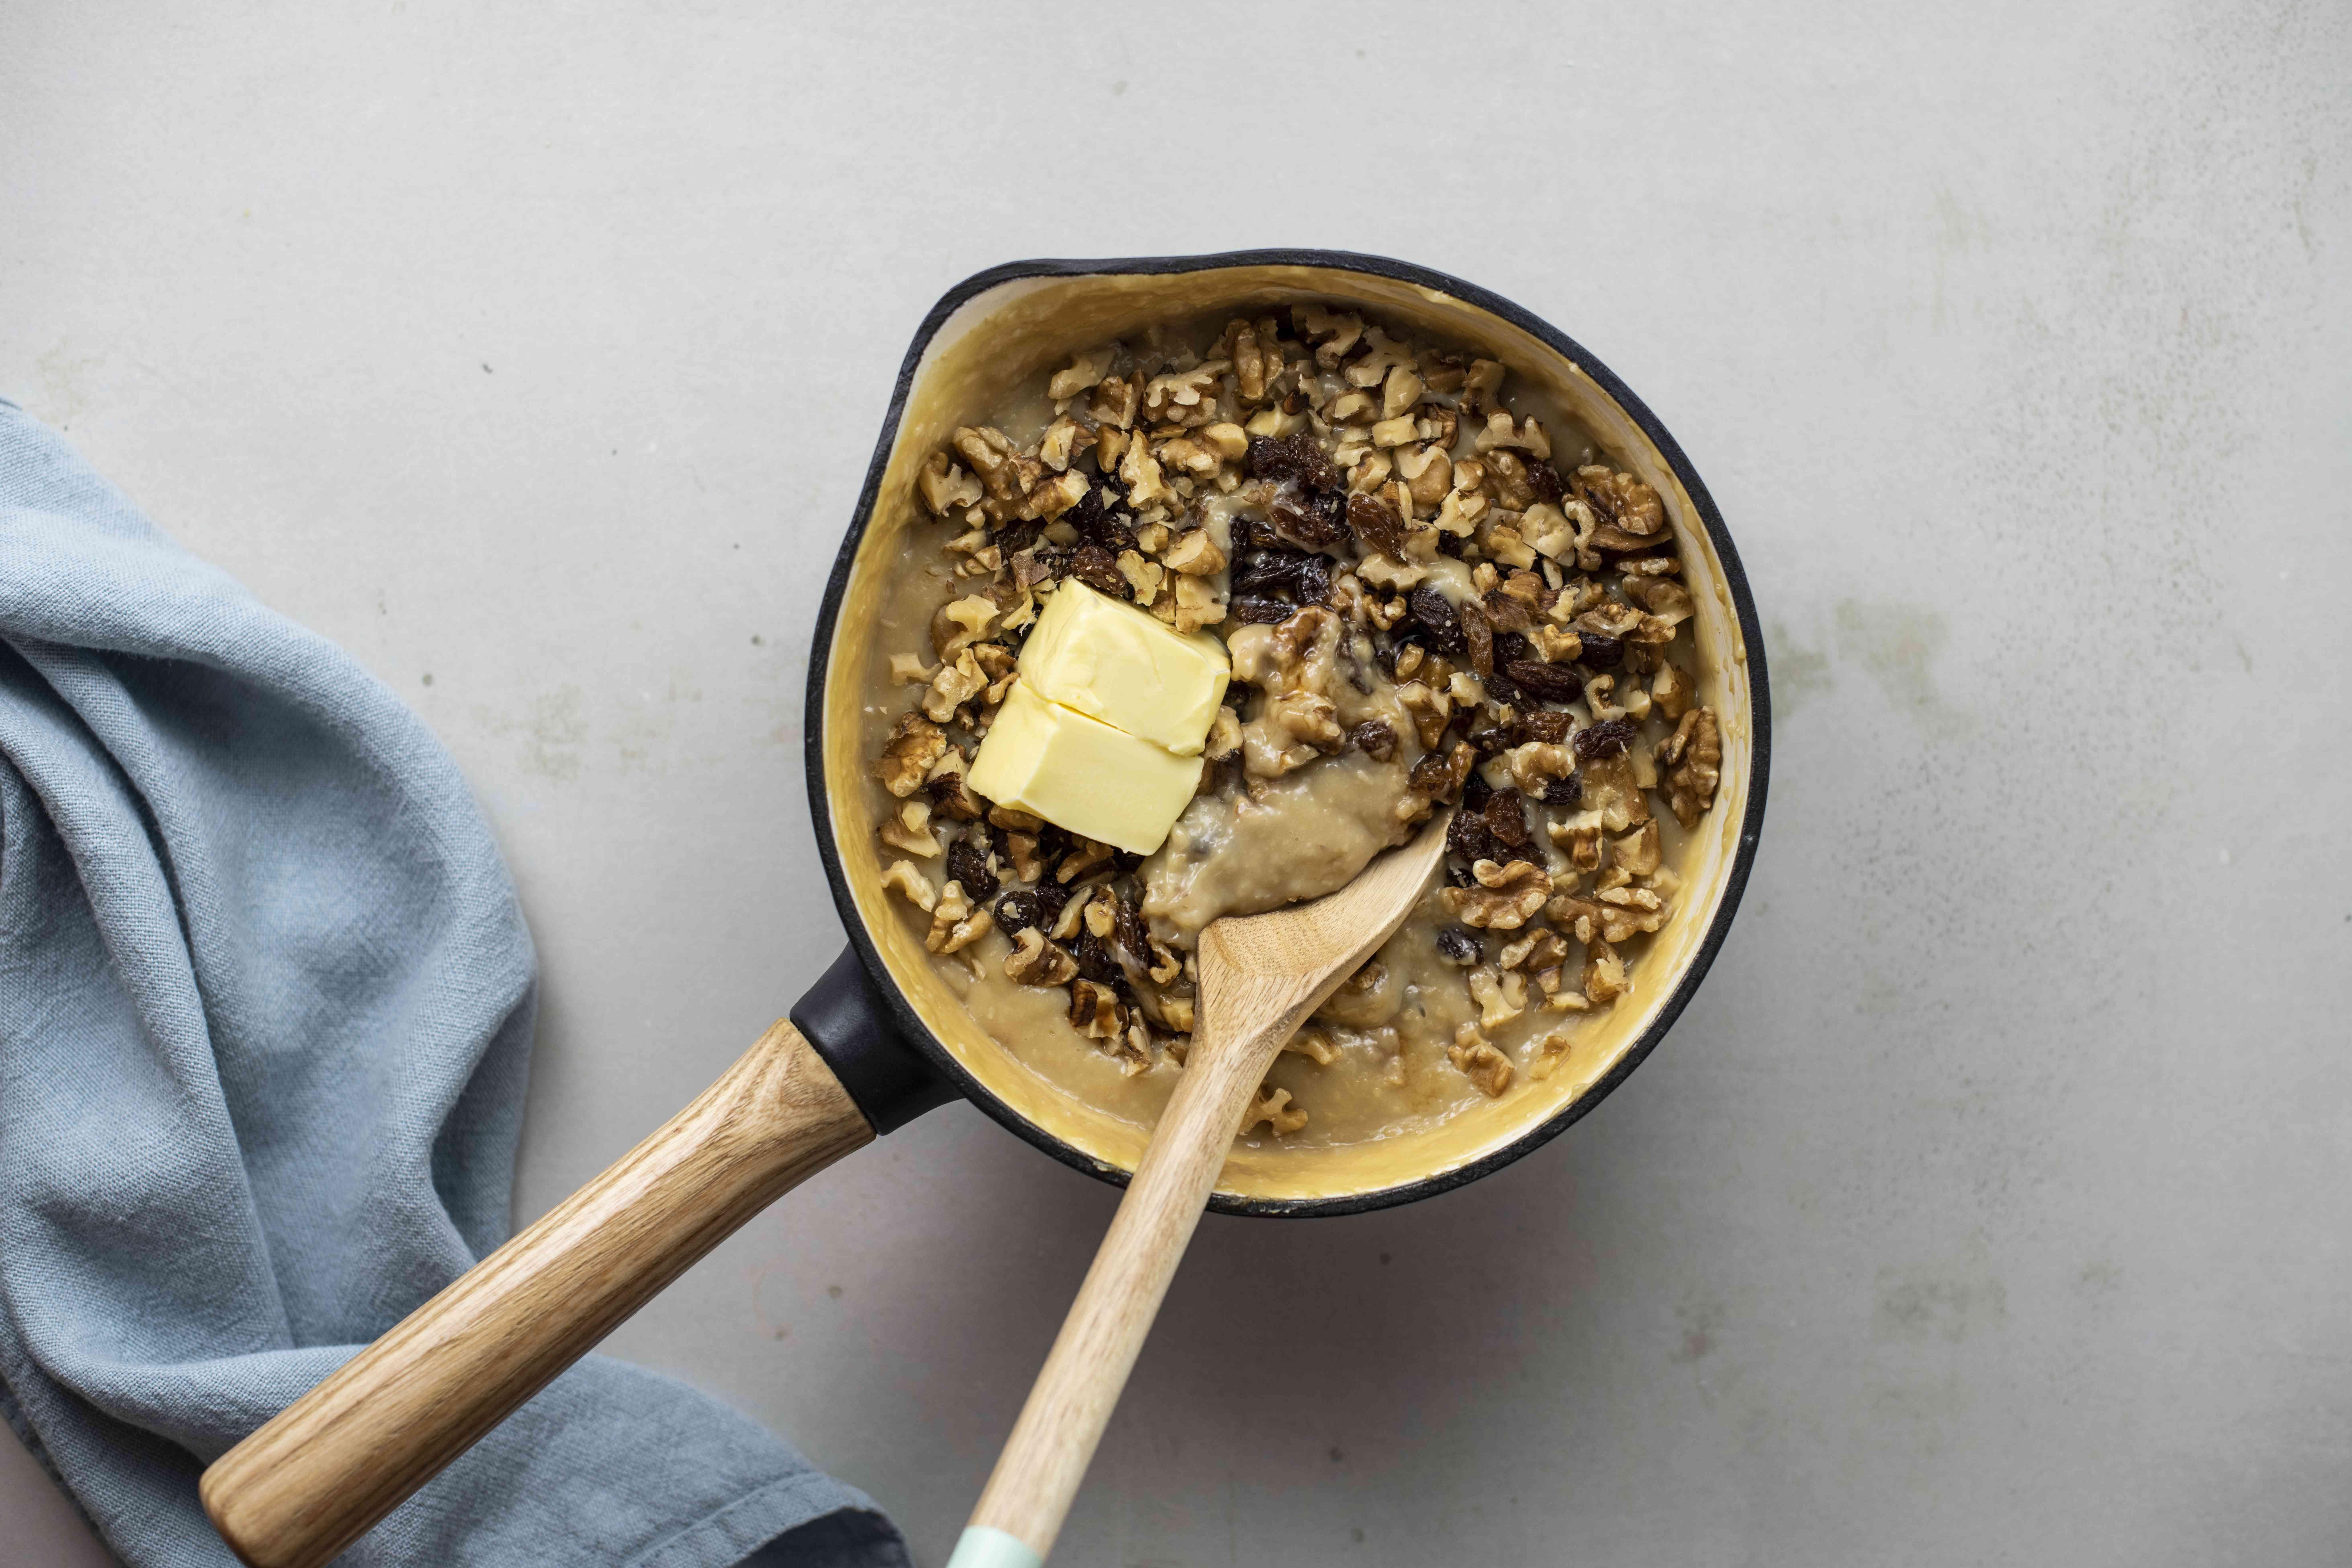 Add raisins and nuts